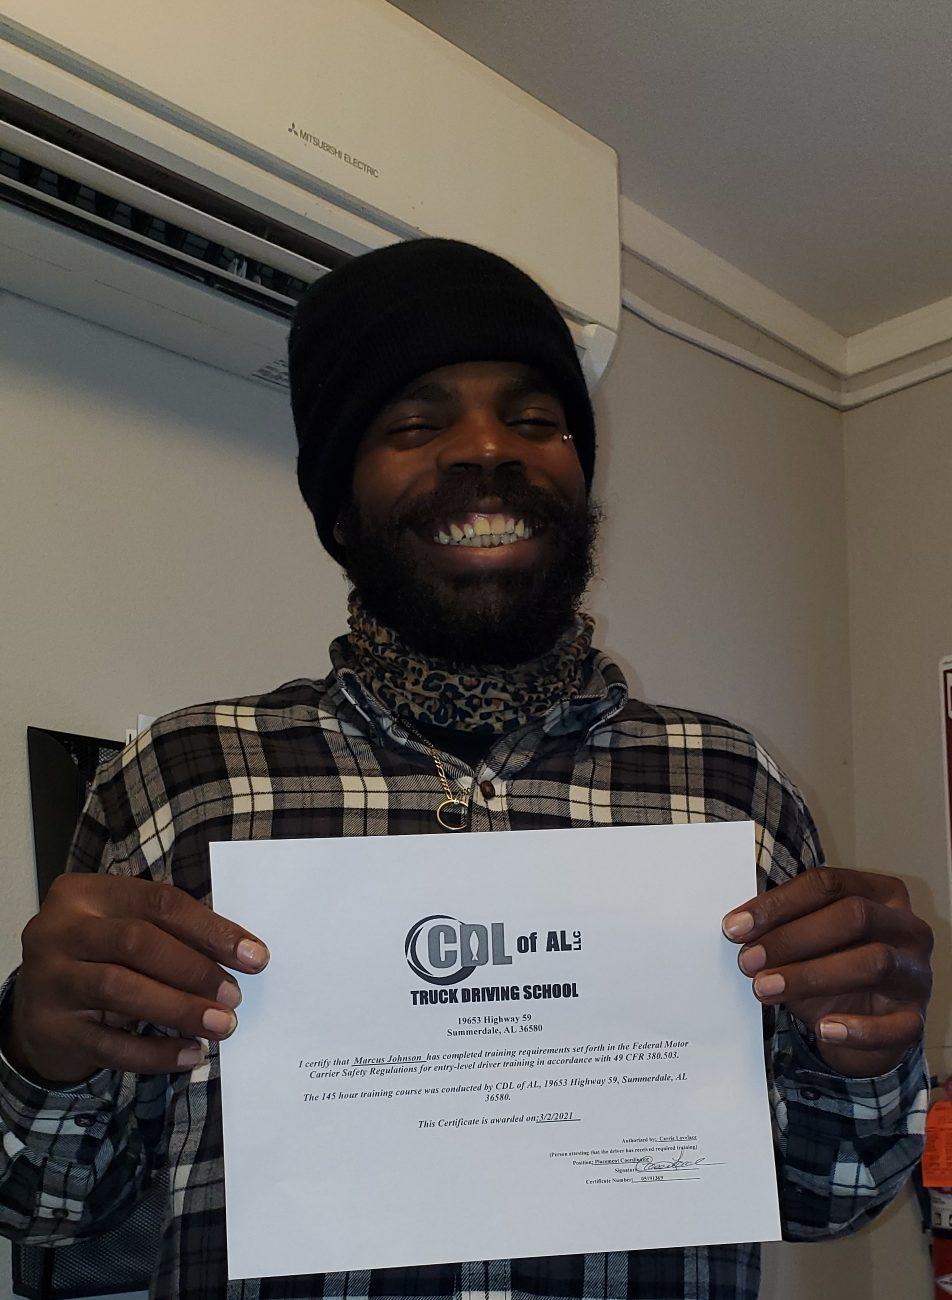 Marcus Johnson, CDL of AL Graduate